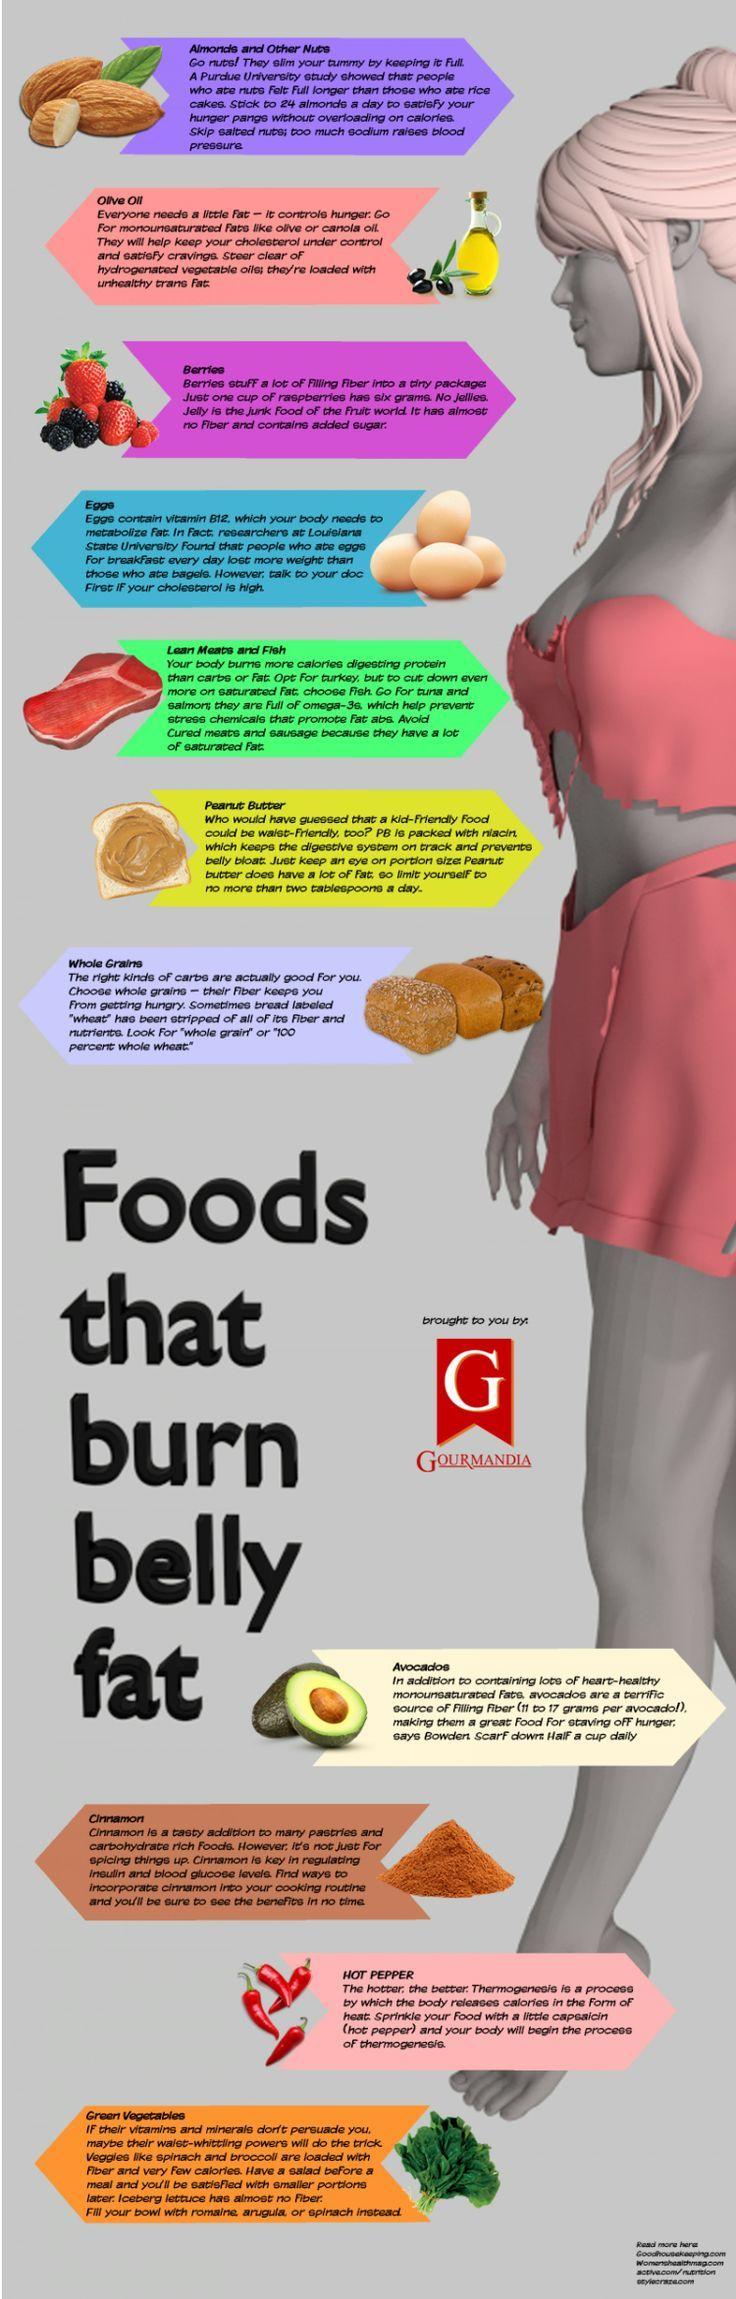 Lose body fat and tighten skin